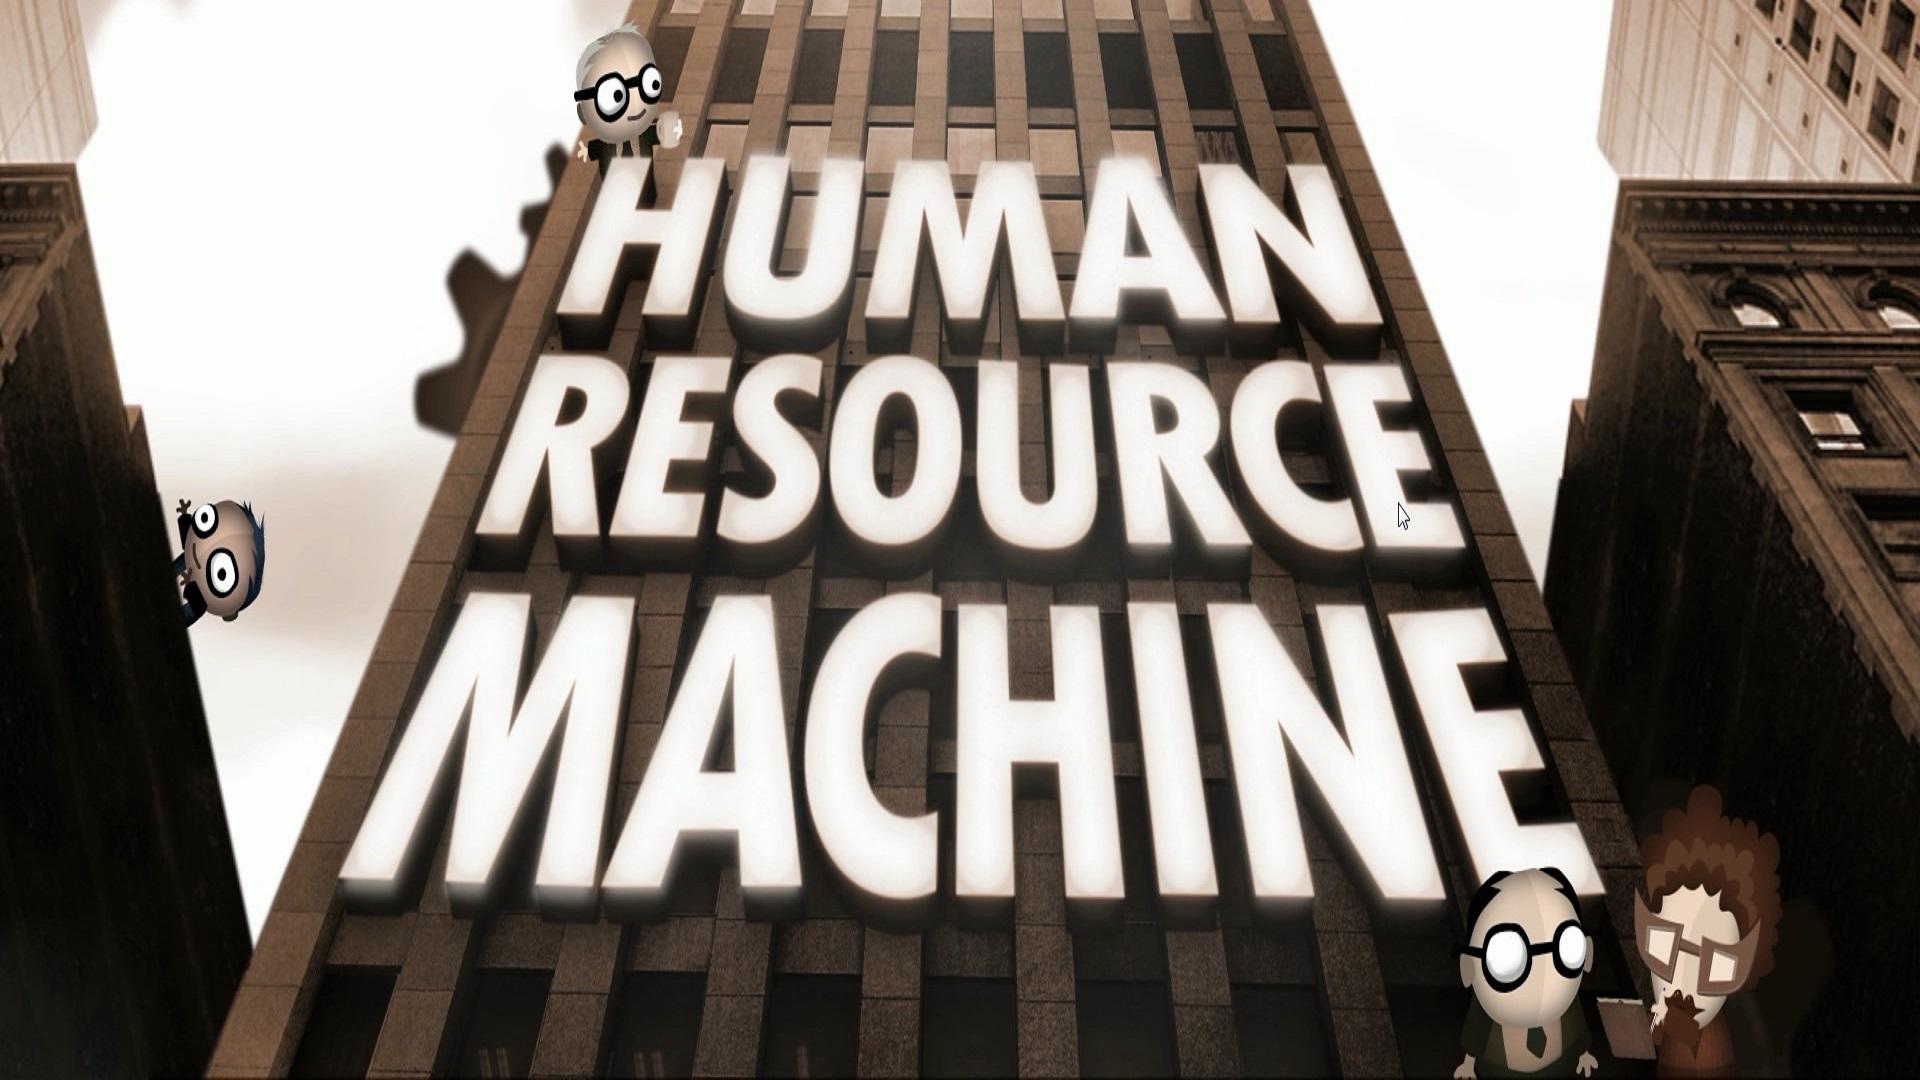 Human Resource Machine, Tomorrow Corporation